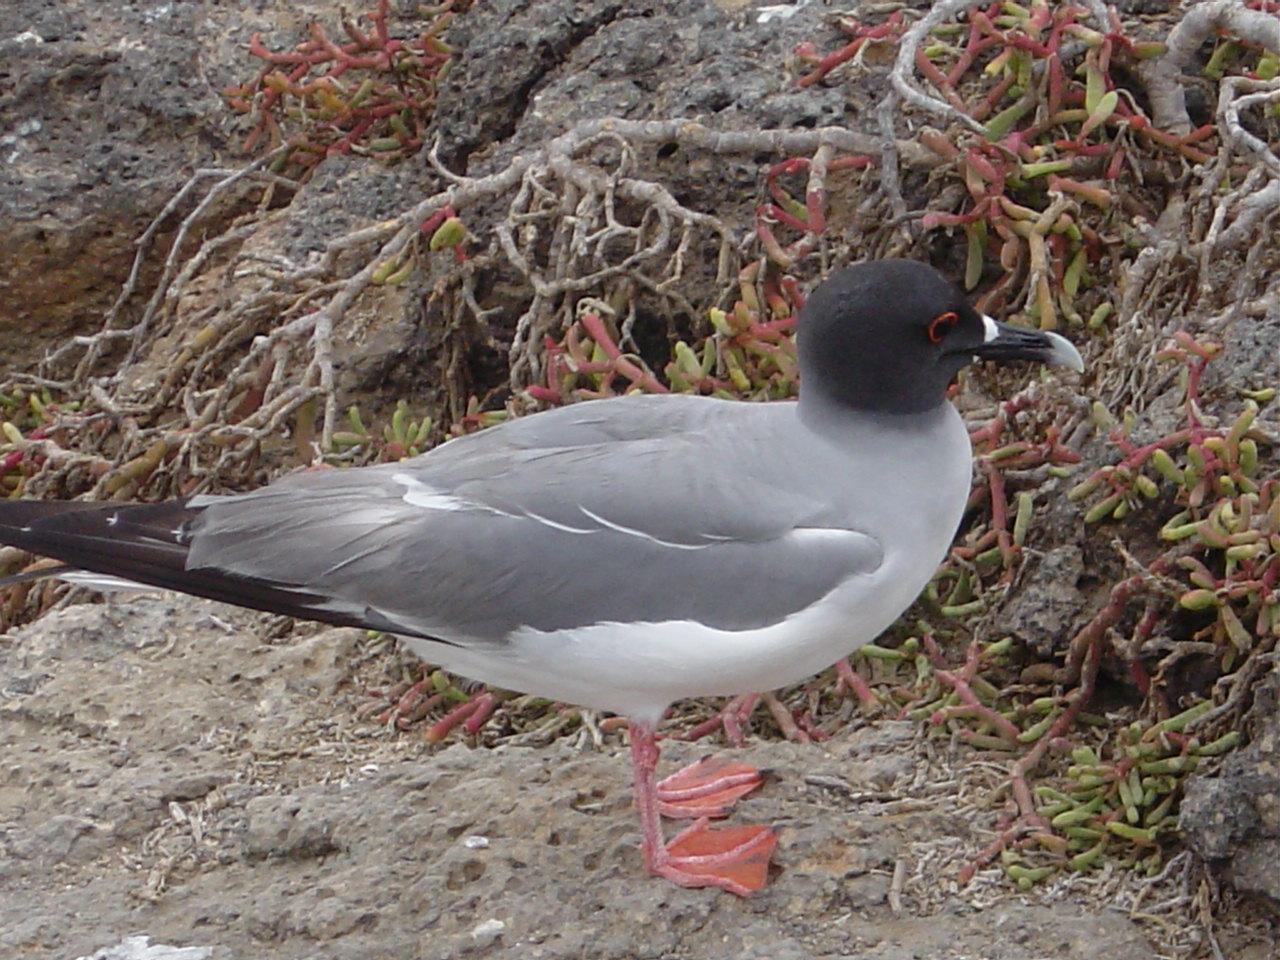 Swallow-tailed Gull Photo by Tony Heindel